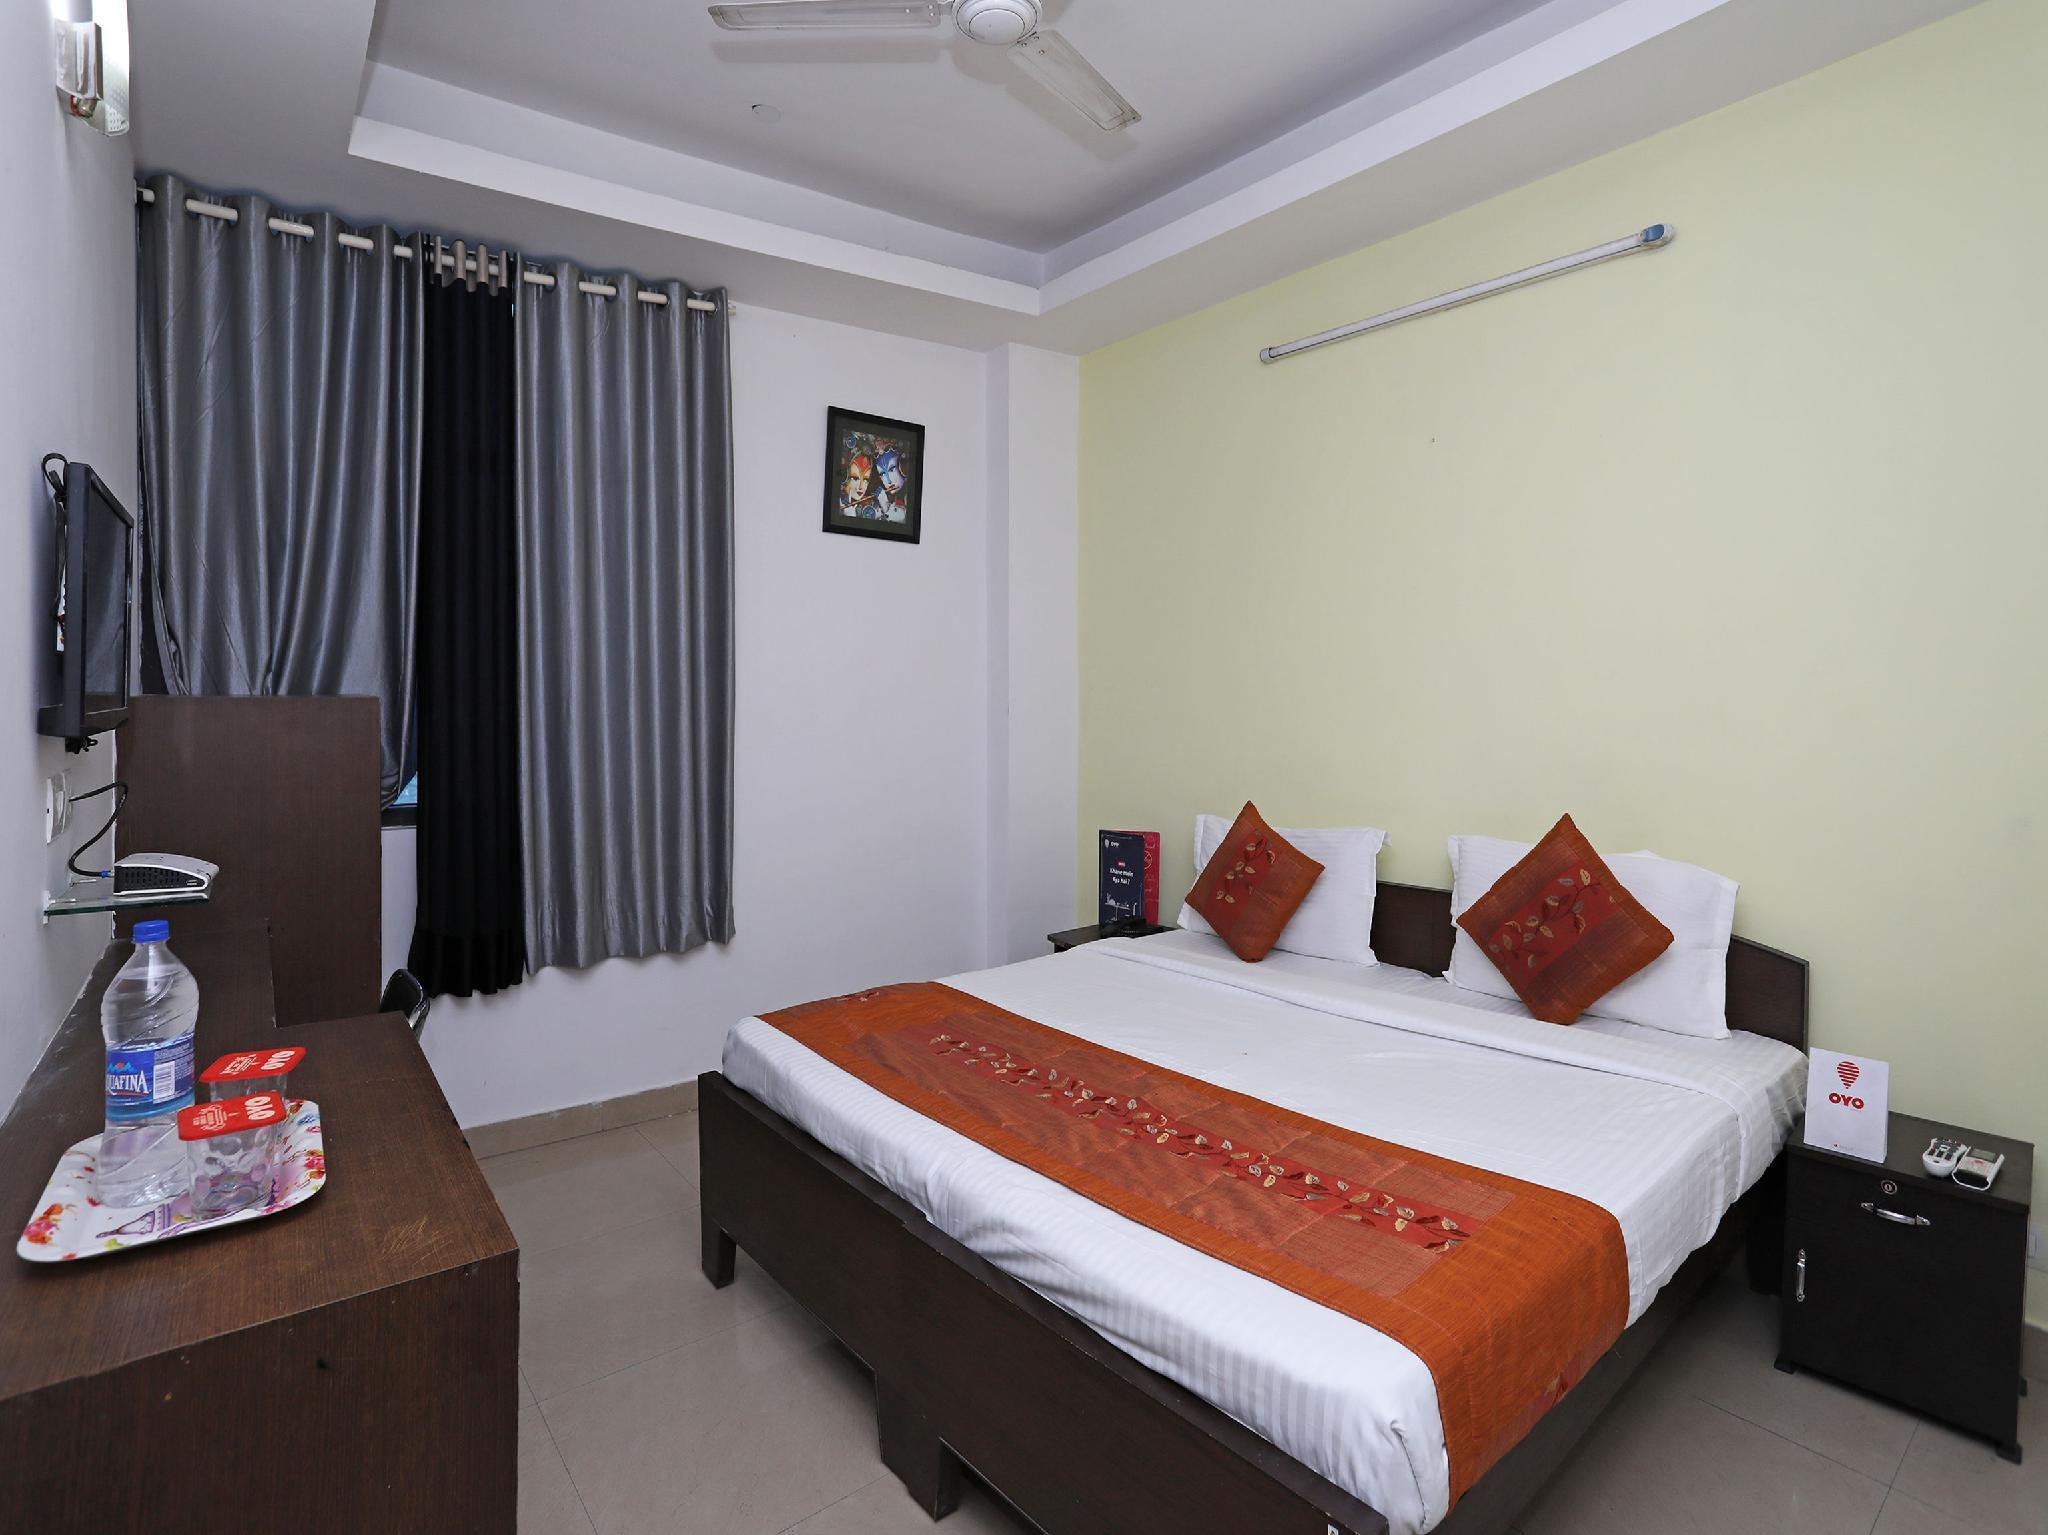 OYO 11392 The Hotel Grand Hospitality, Gautam Buddha Nagar